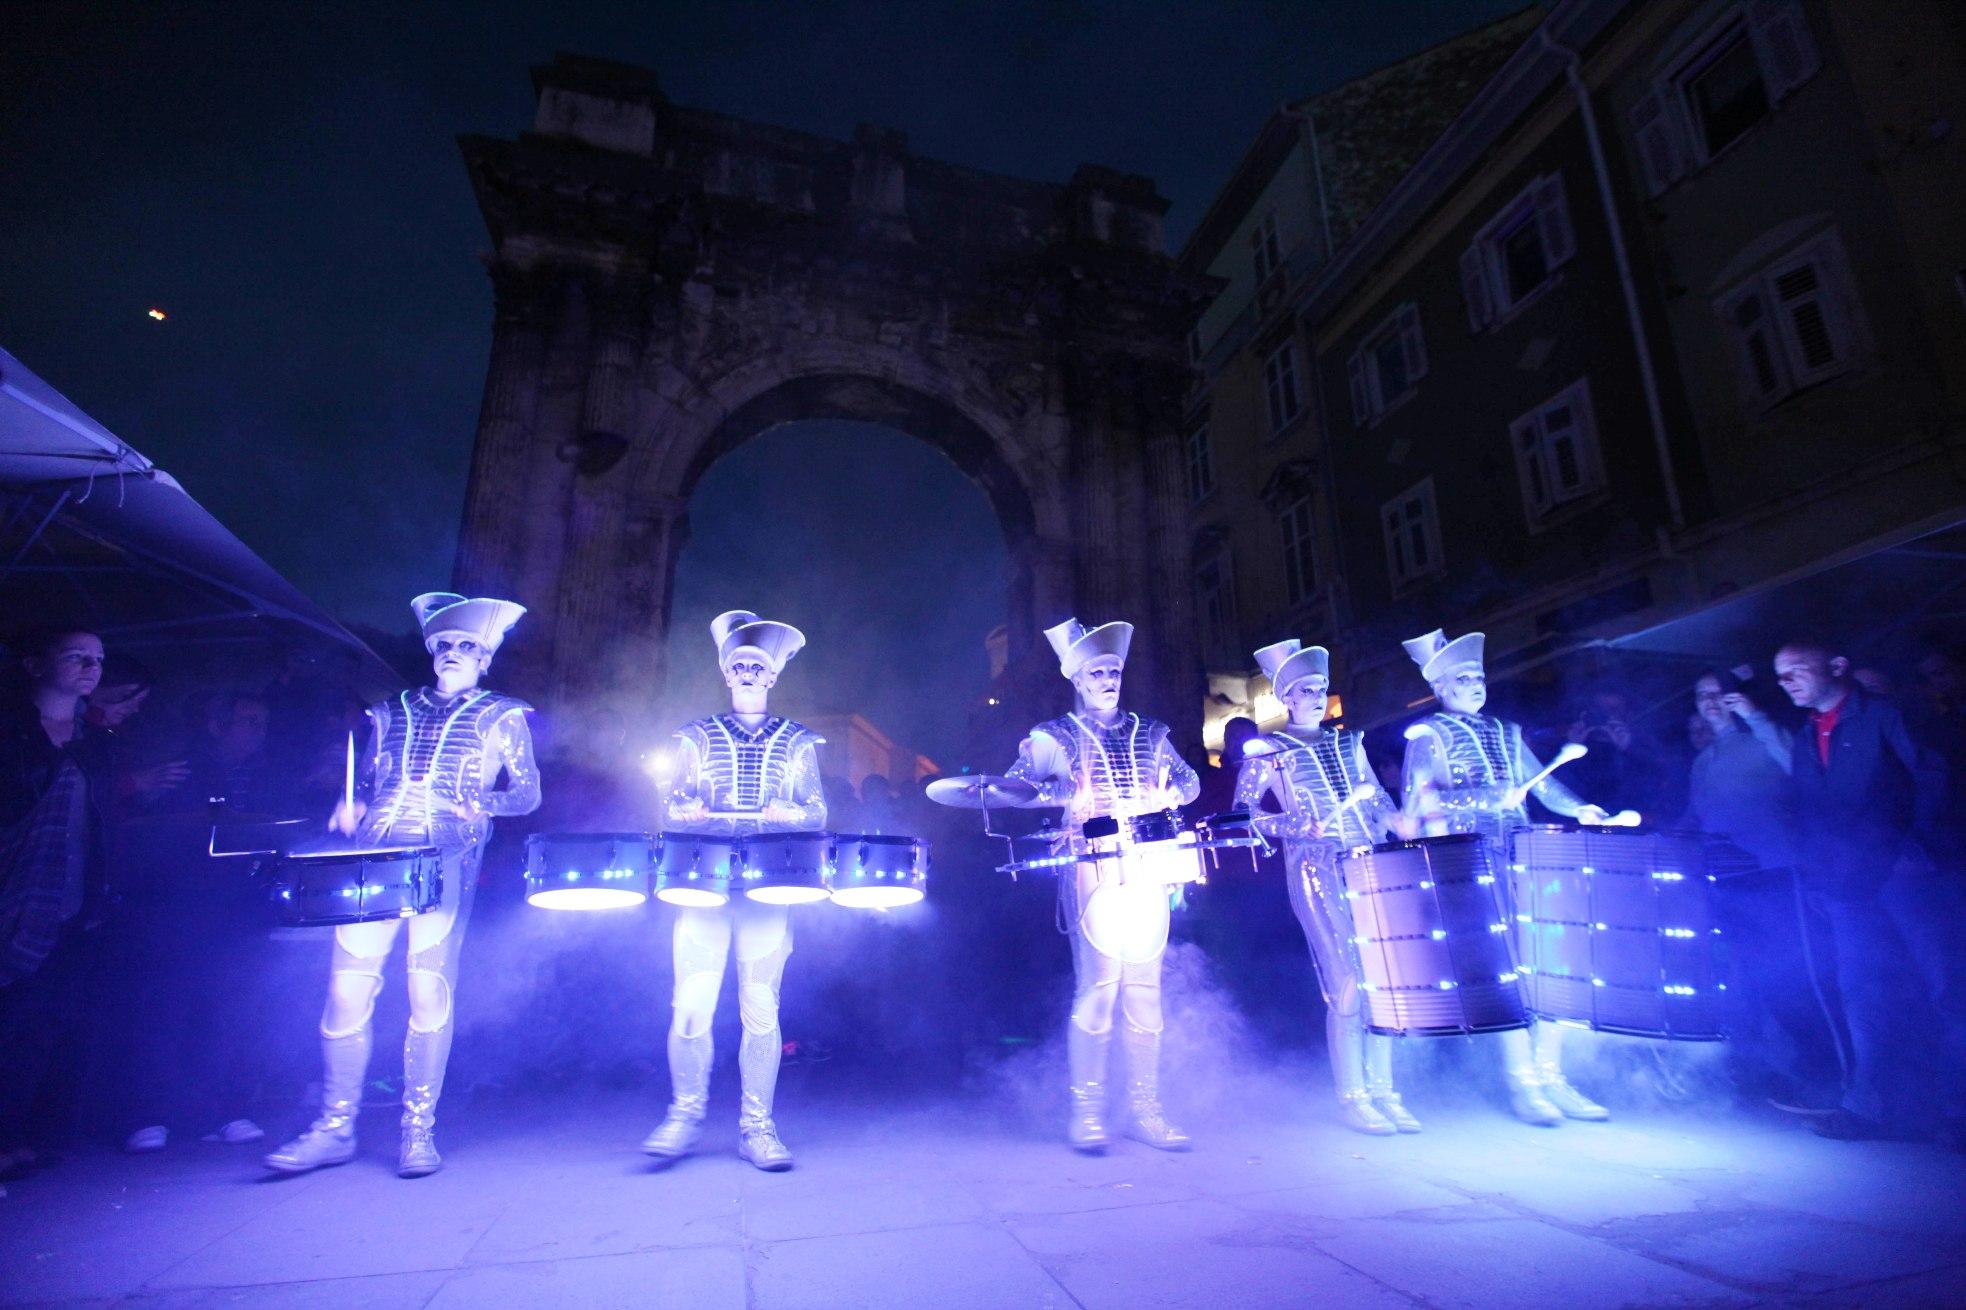 Spark! Led Drummers_Visualia Festival 2014_slaven radolovic